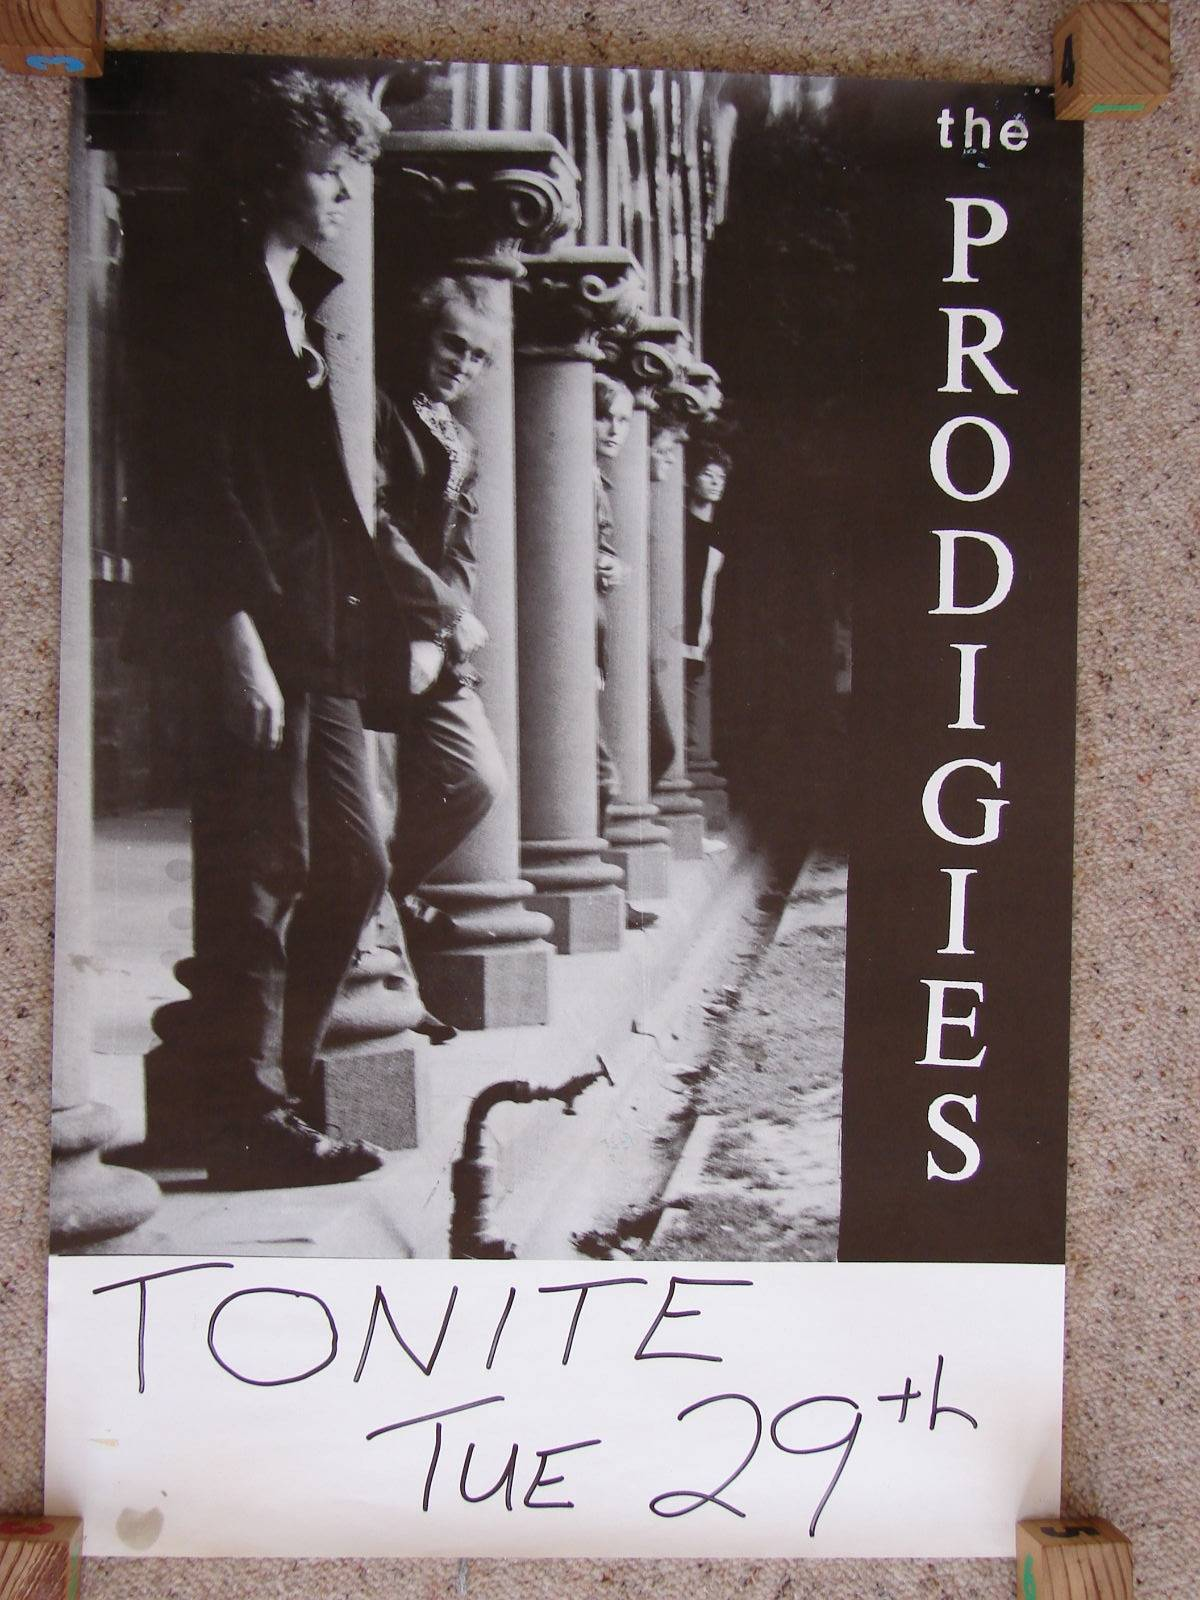 The Prodigies (Christchurch)